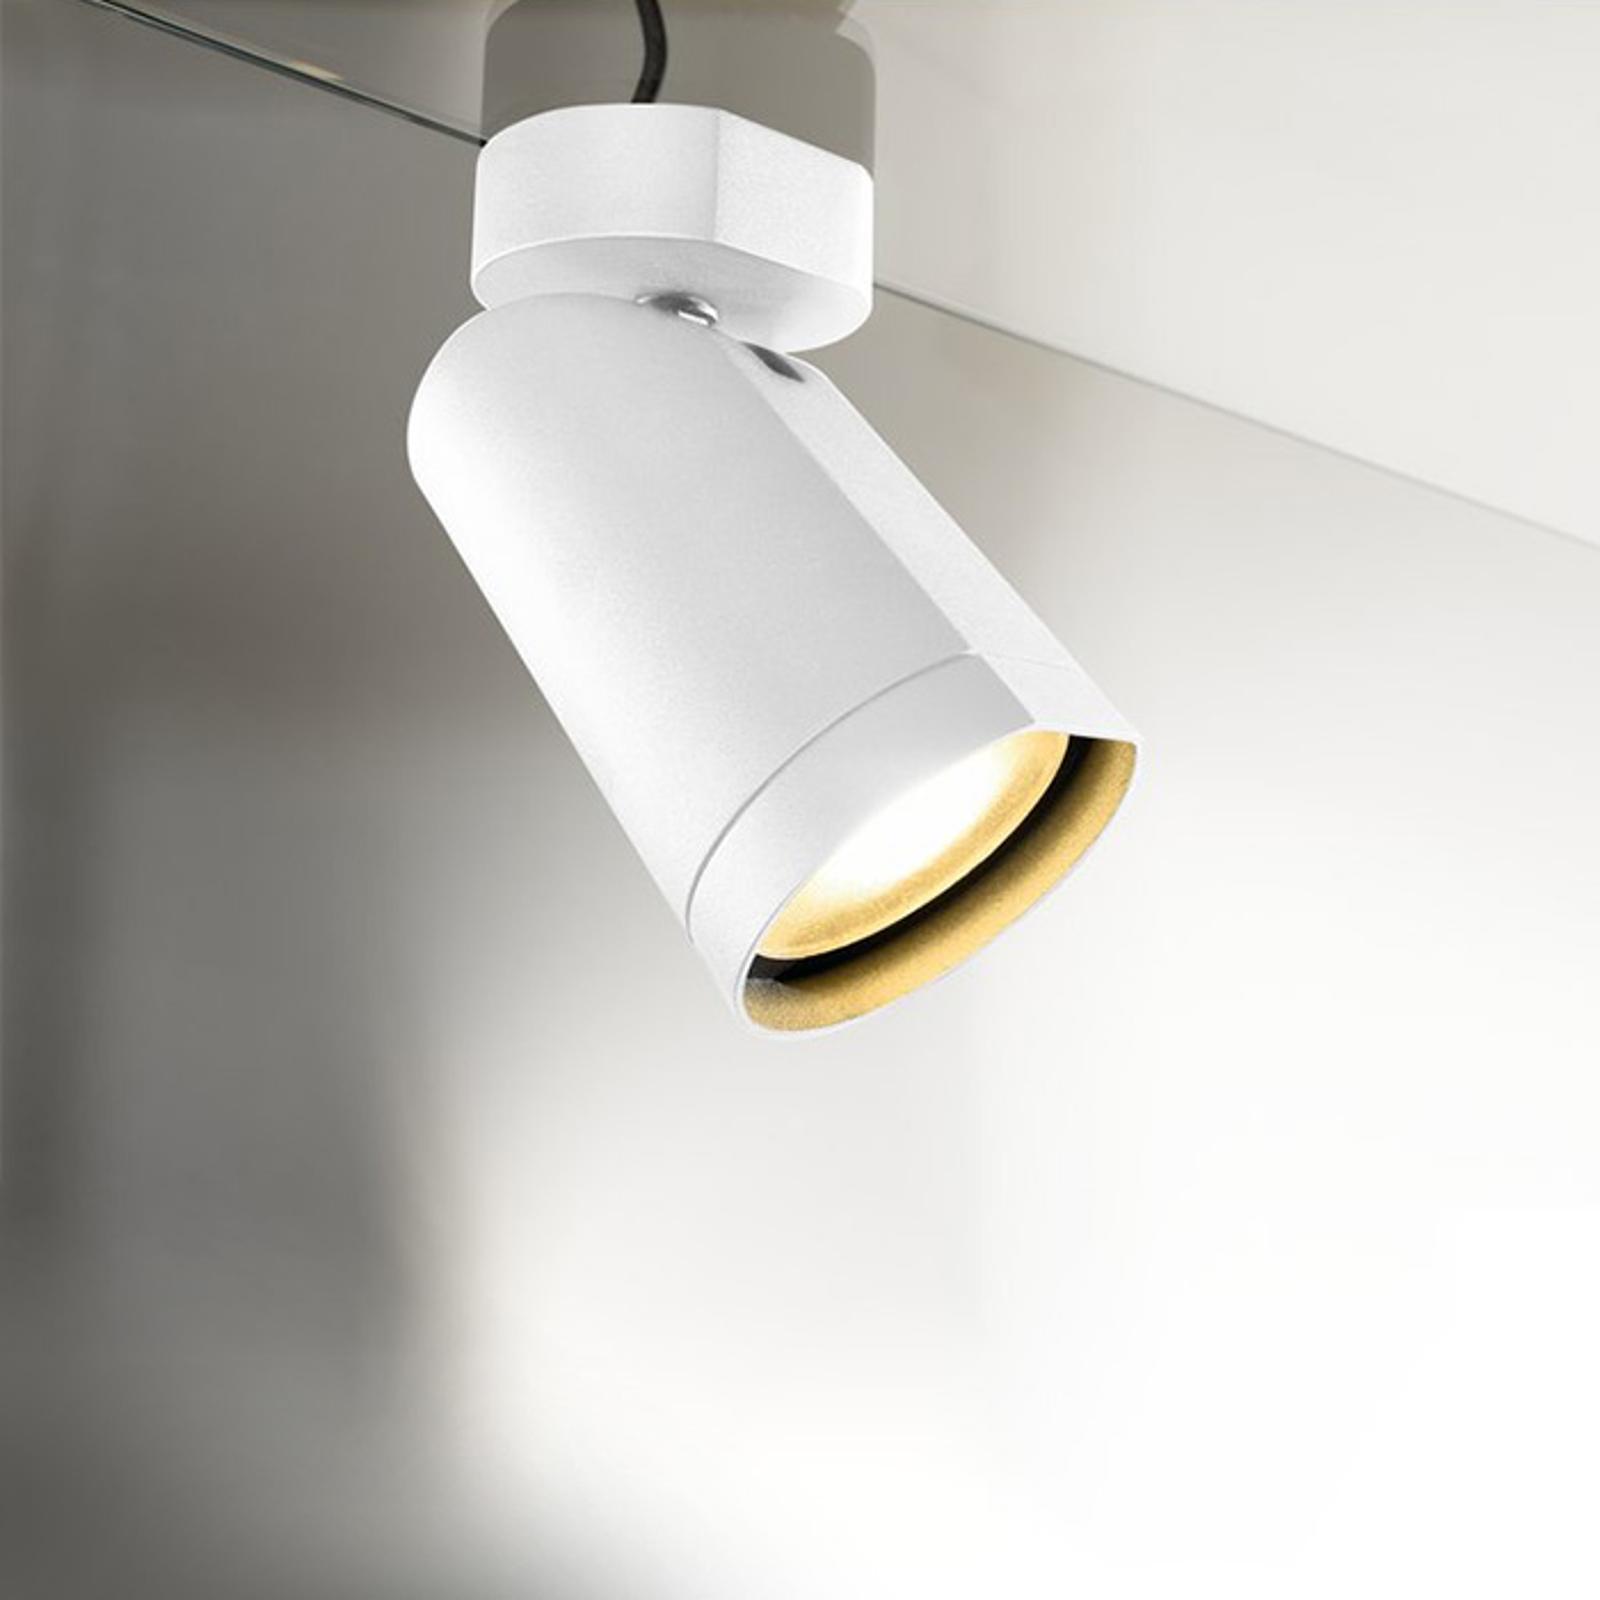 Draaibare plafondspot LED Bilas 1 lichtbr. wit